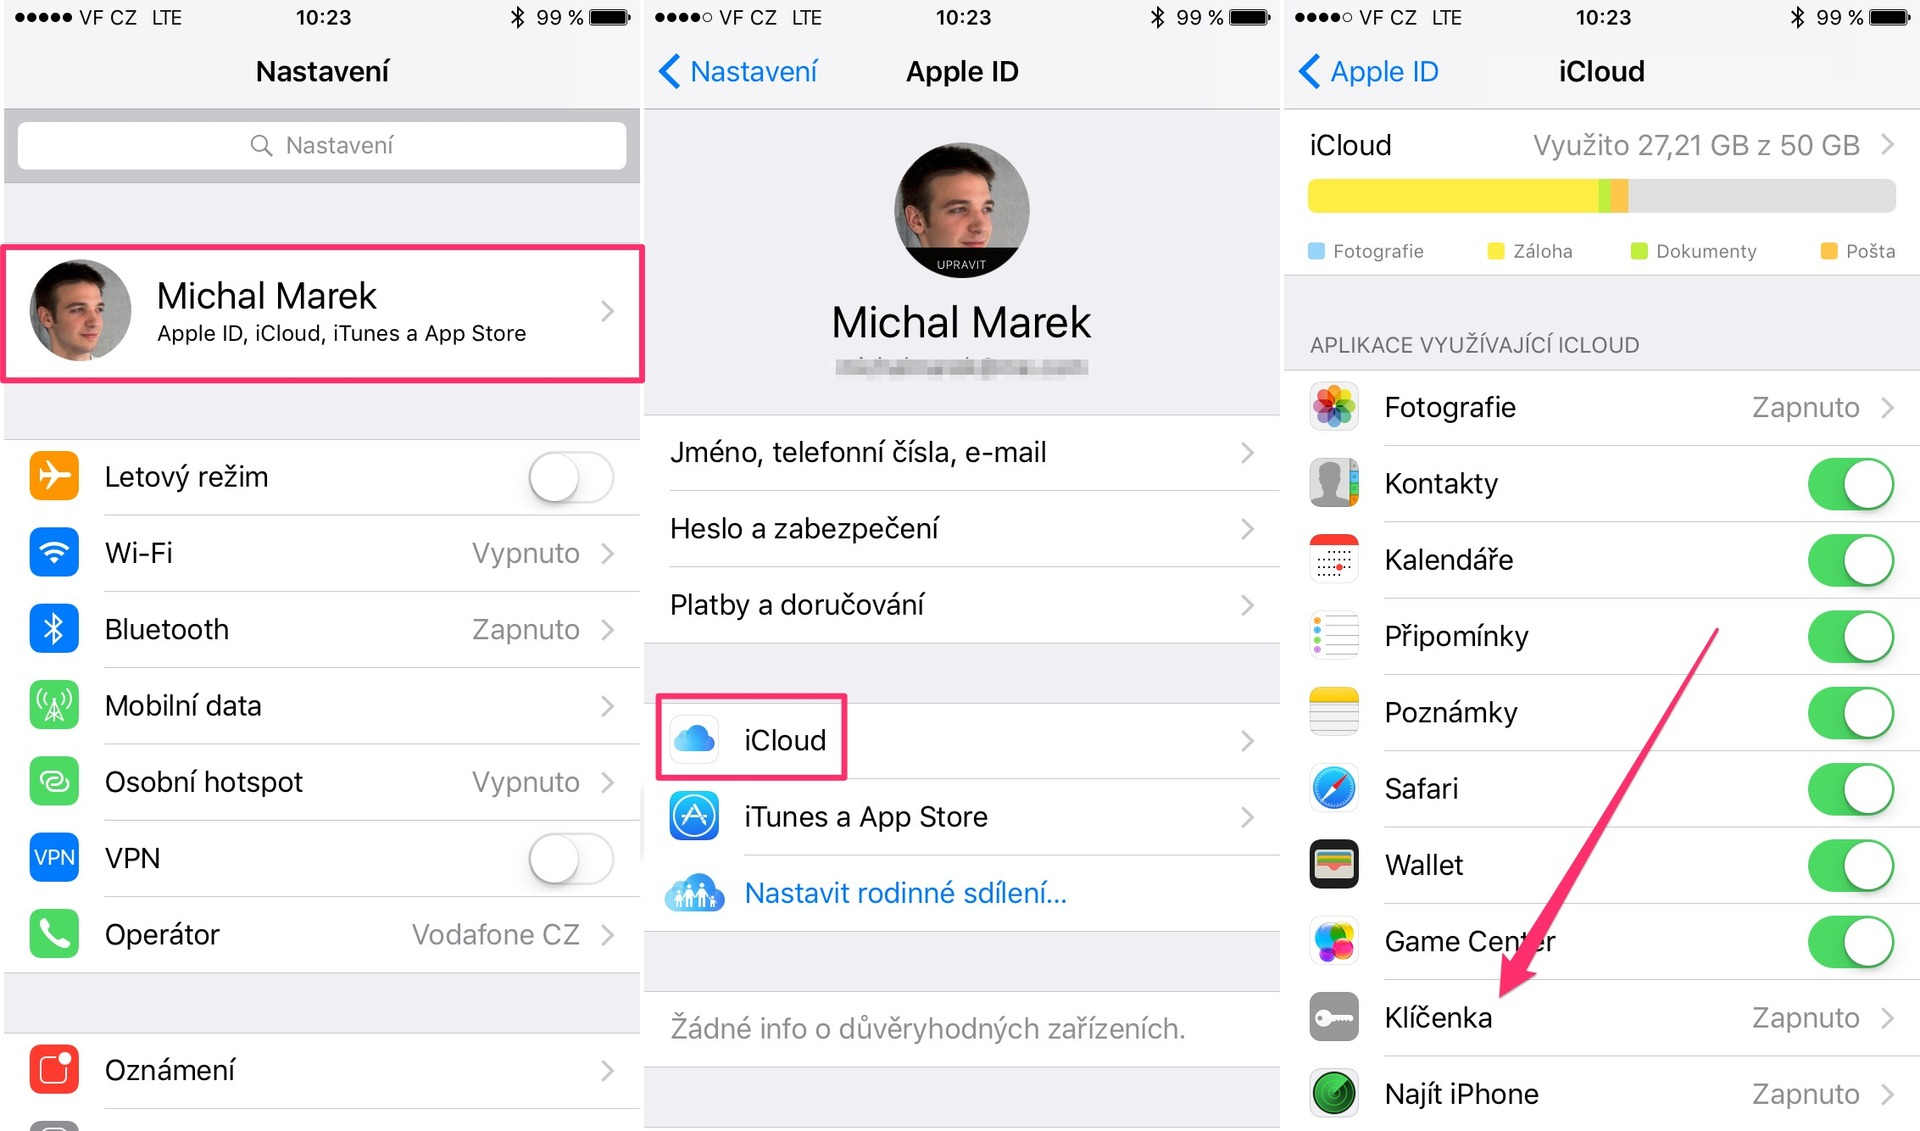 iCloud keychain 1